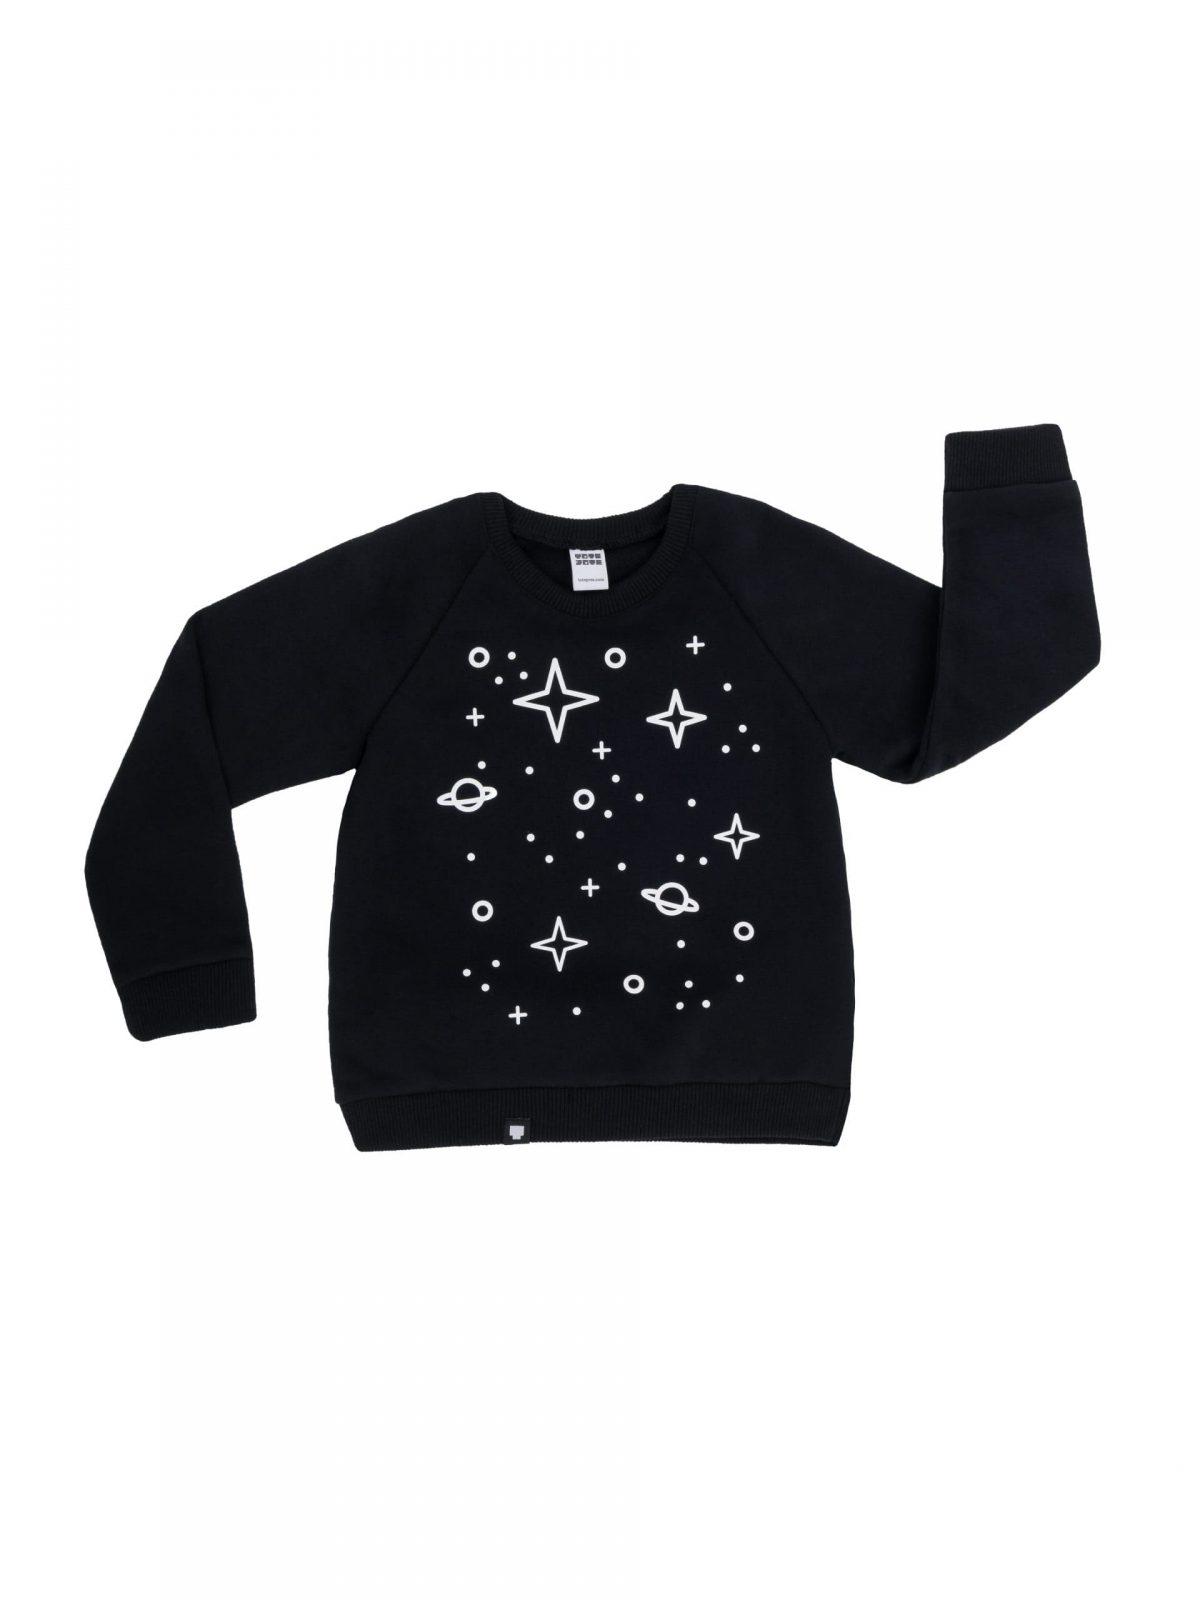 "Детска блузка ""Космос"": мека, топла и удобна – Тоте Поте"